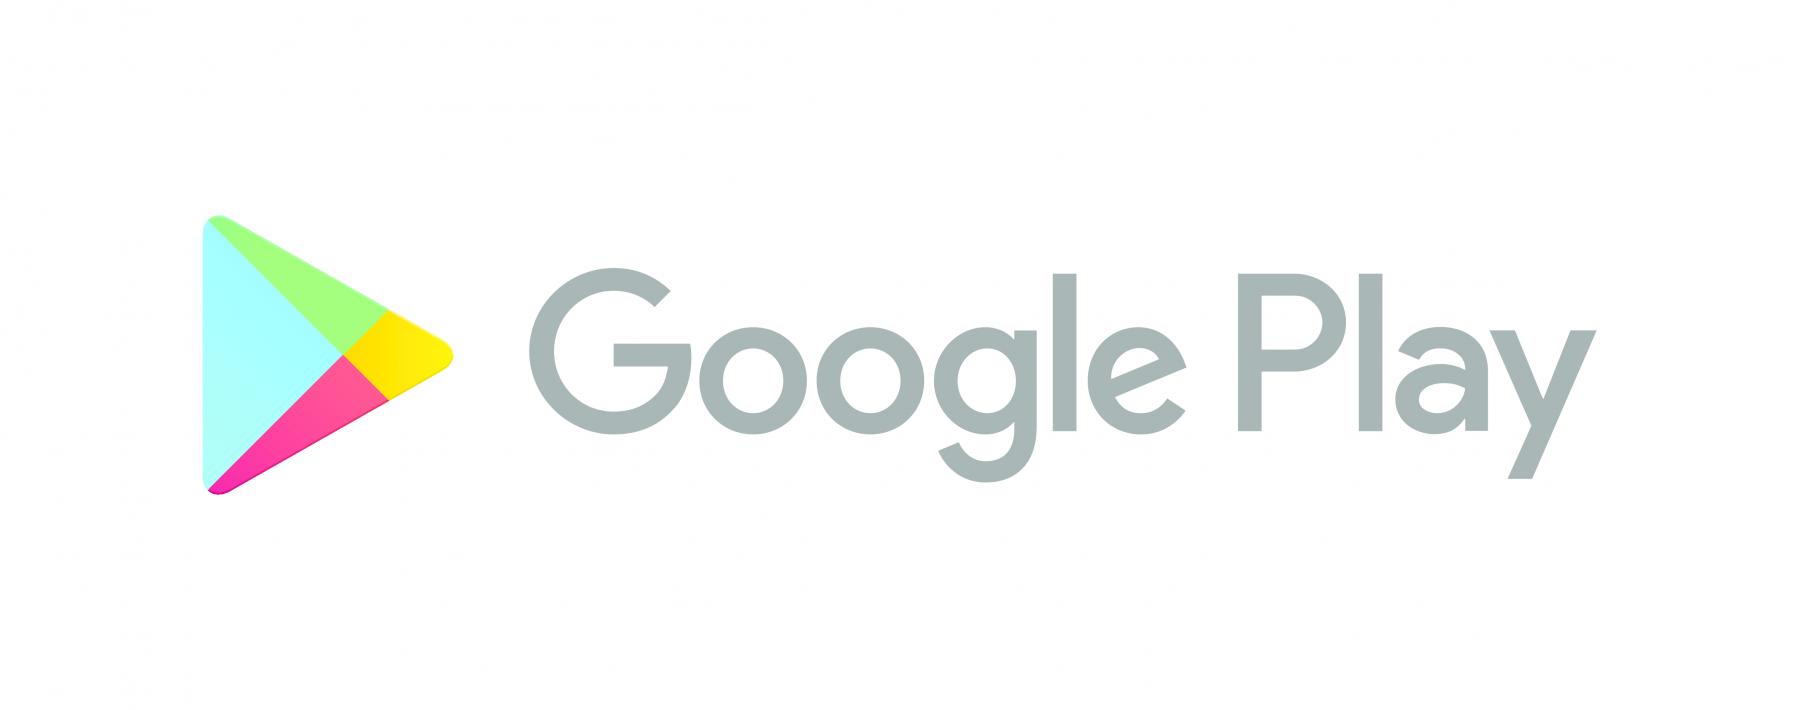 Google Play Prism Horiz Gray Rgb